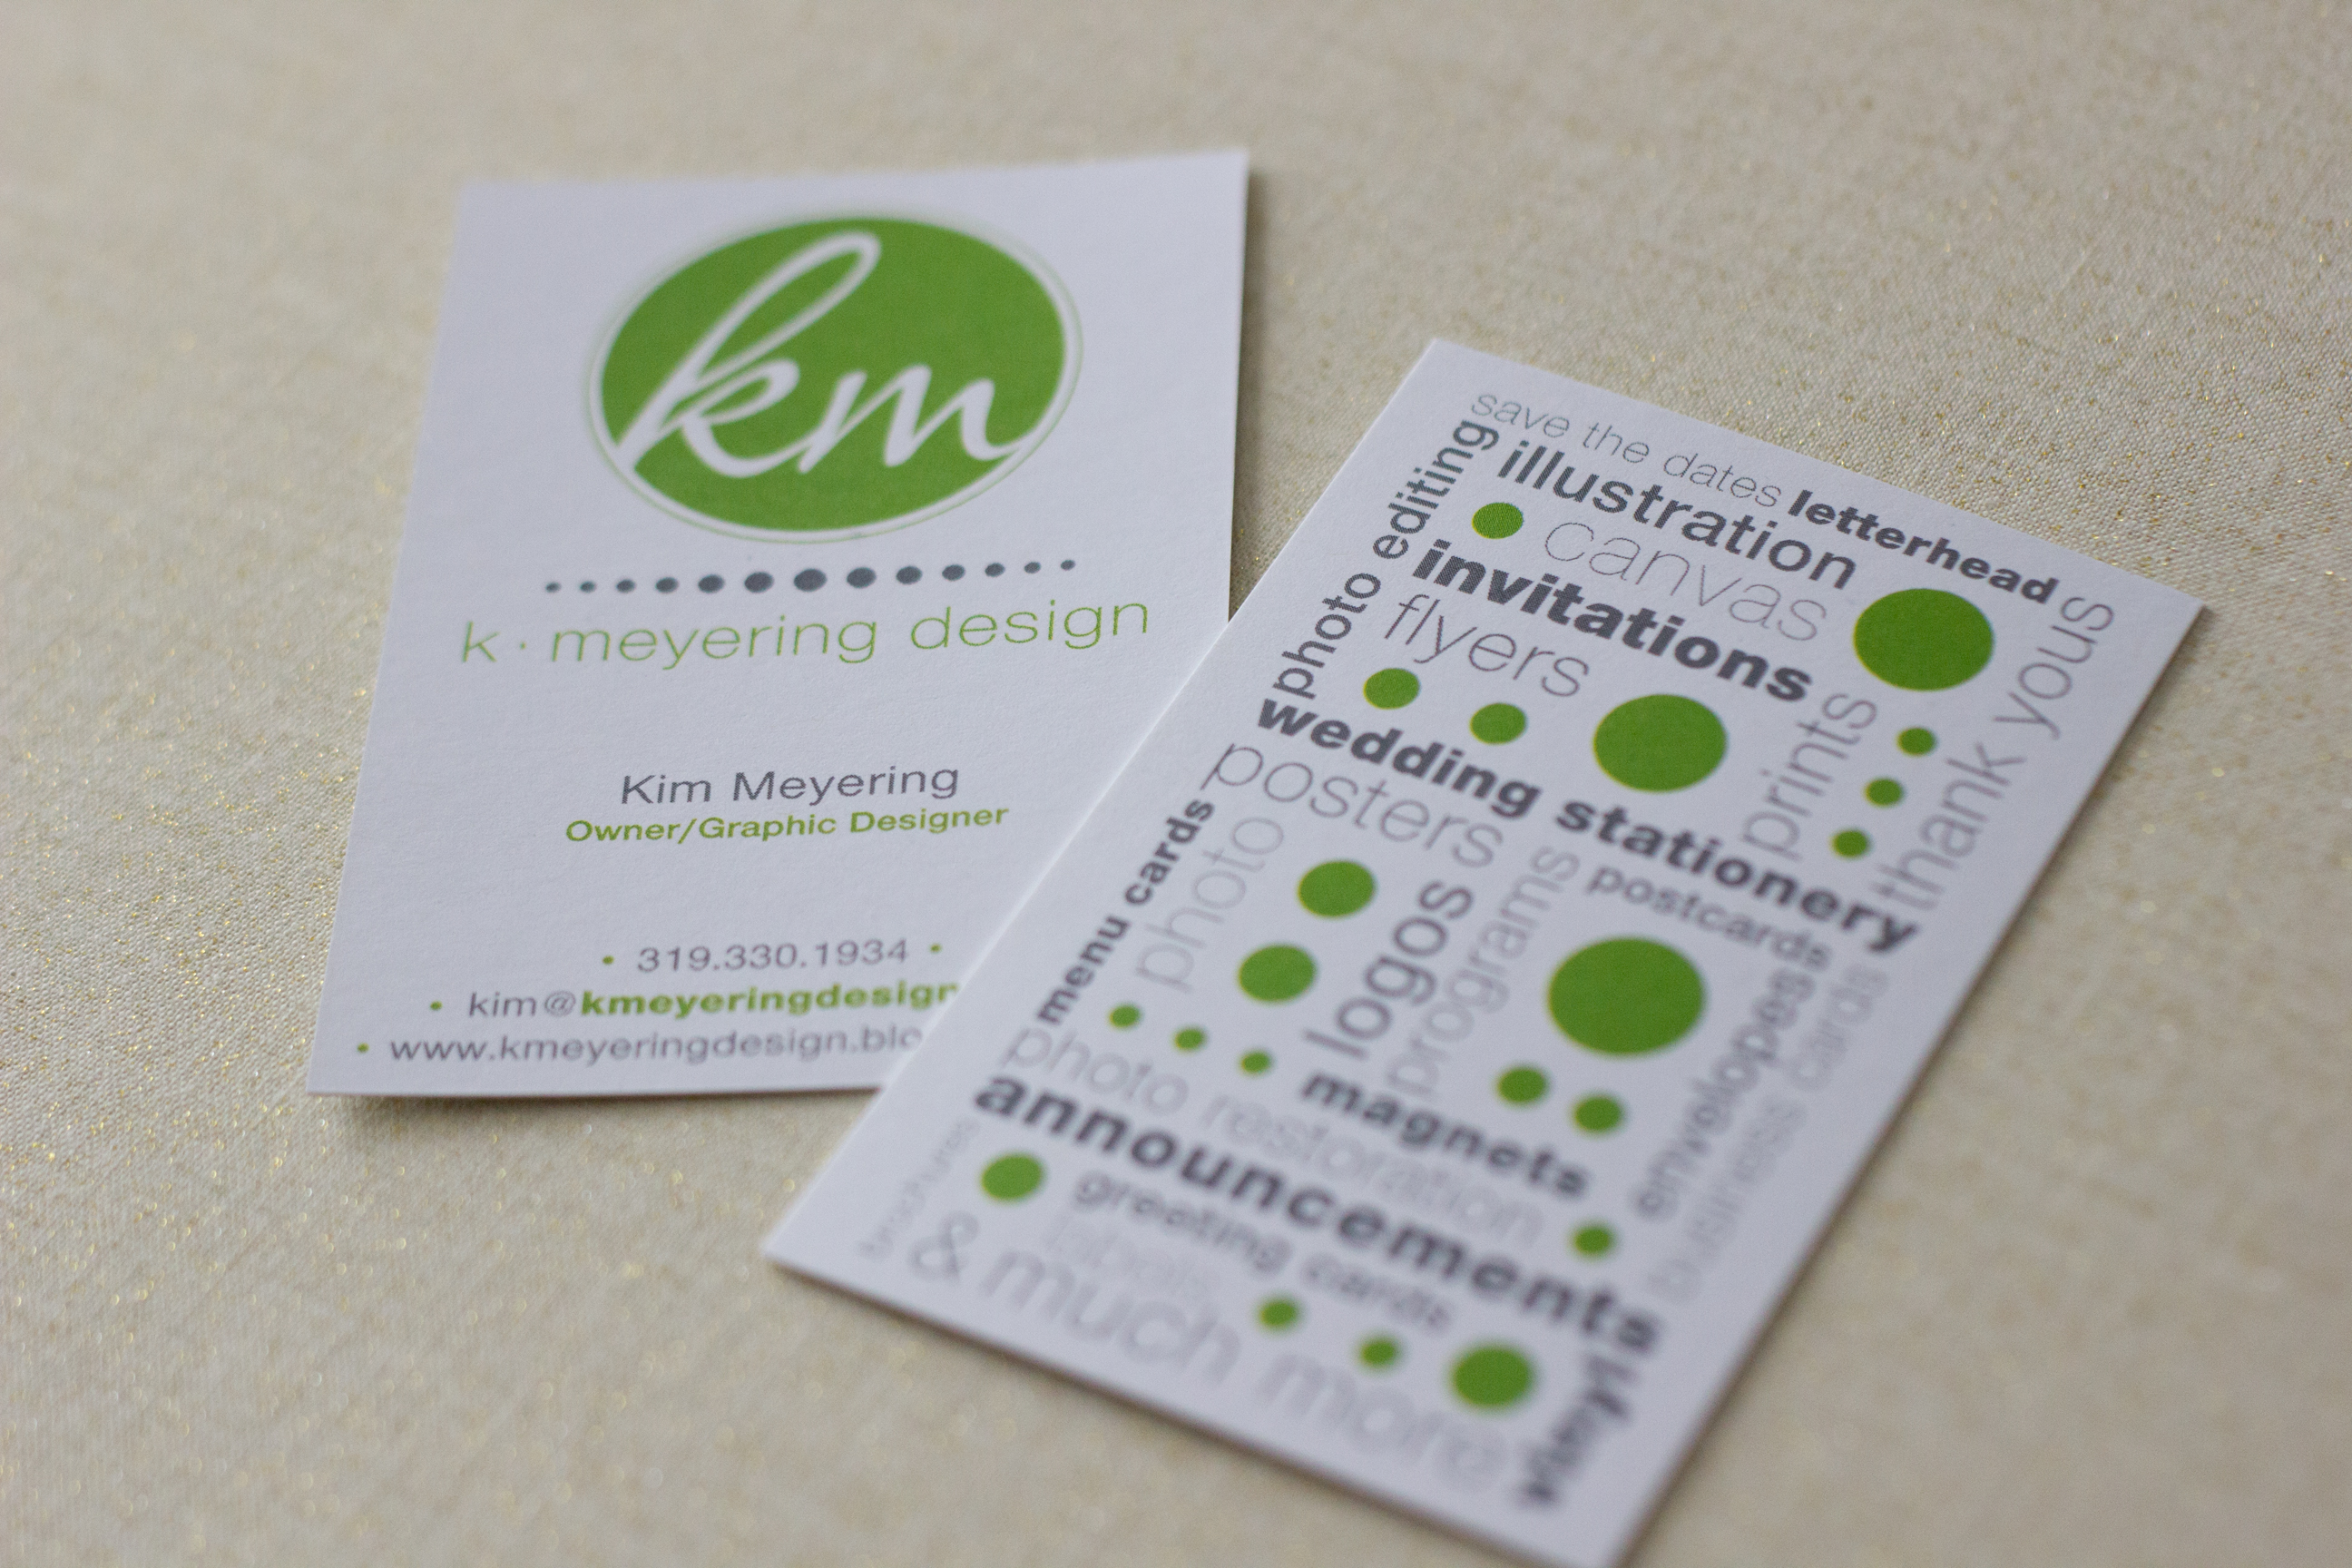 K Meyering Design